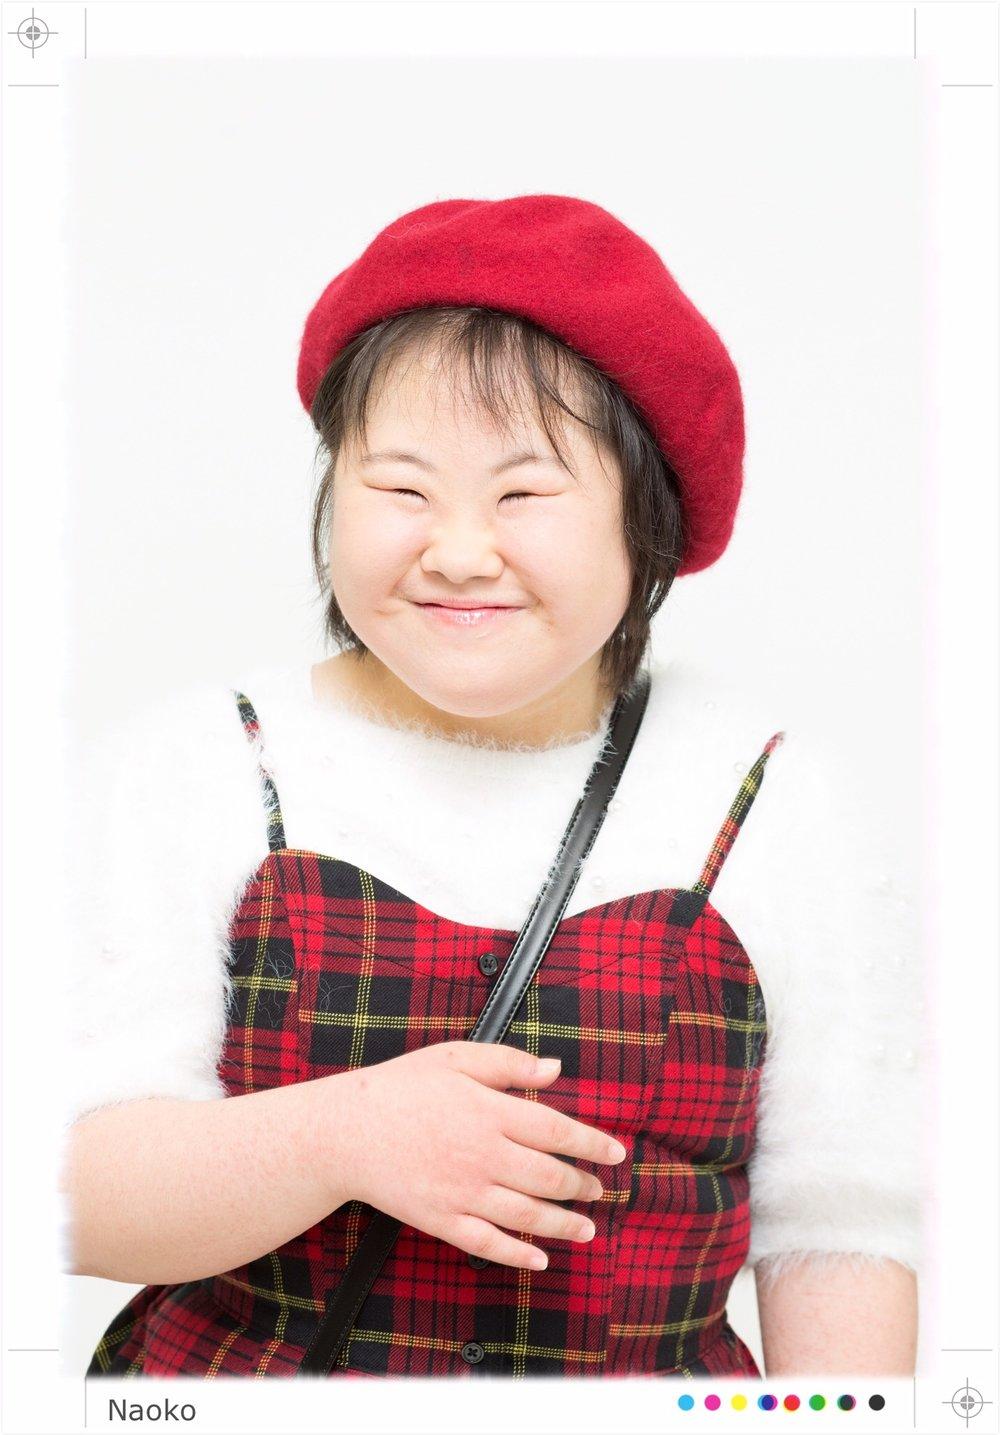 Naoko なおこ - 嵐の歌が大好き。自分がきれいになるため、応募しました!I love the band ARASHI. I entered this contest to become beautiful.